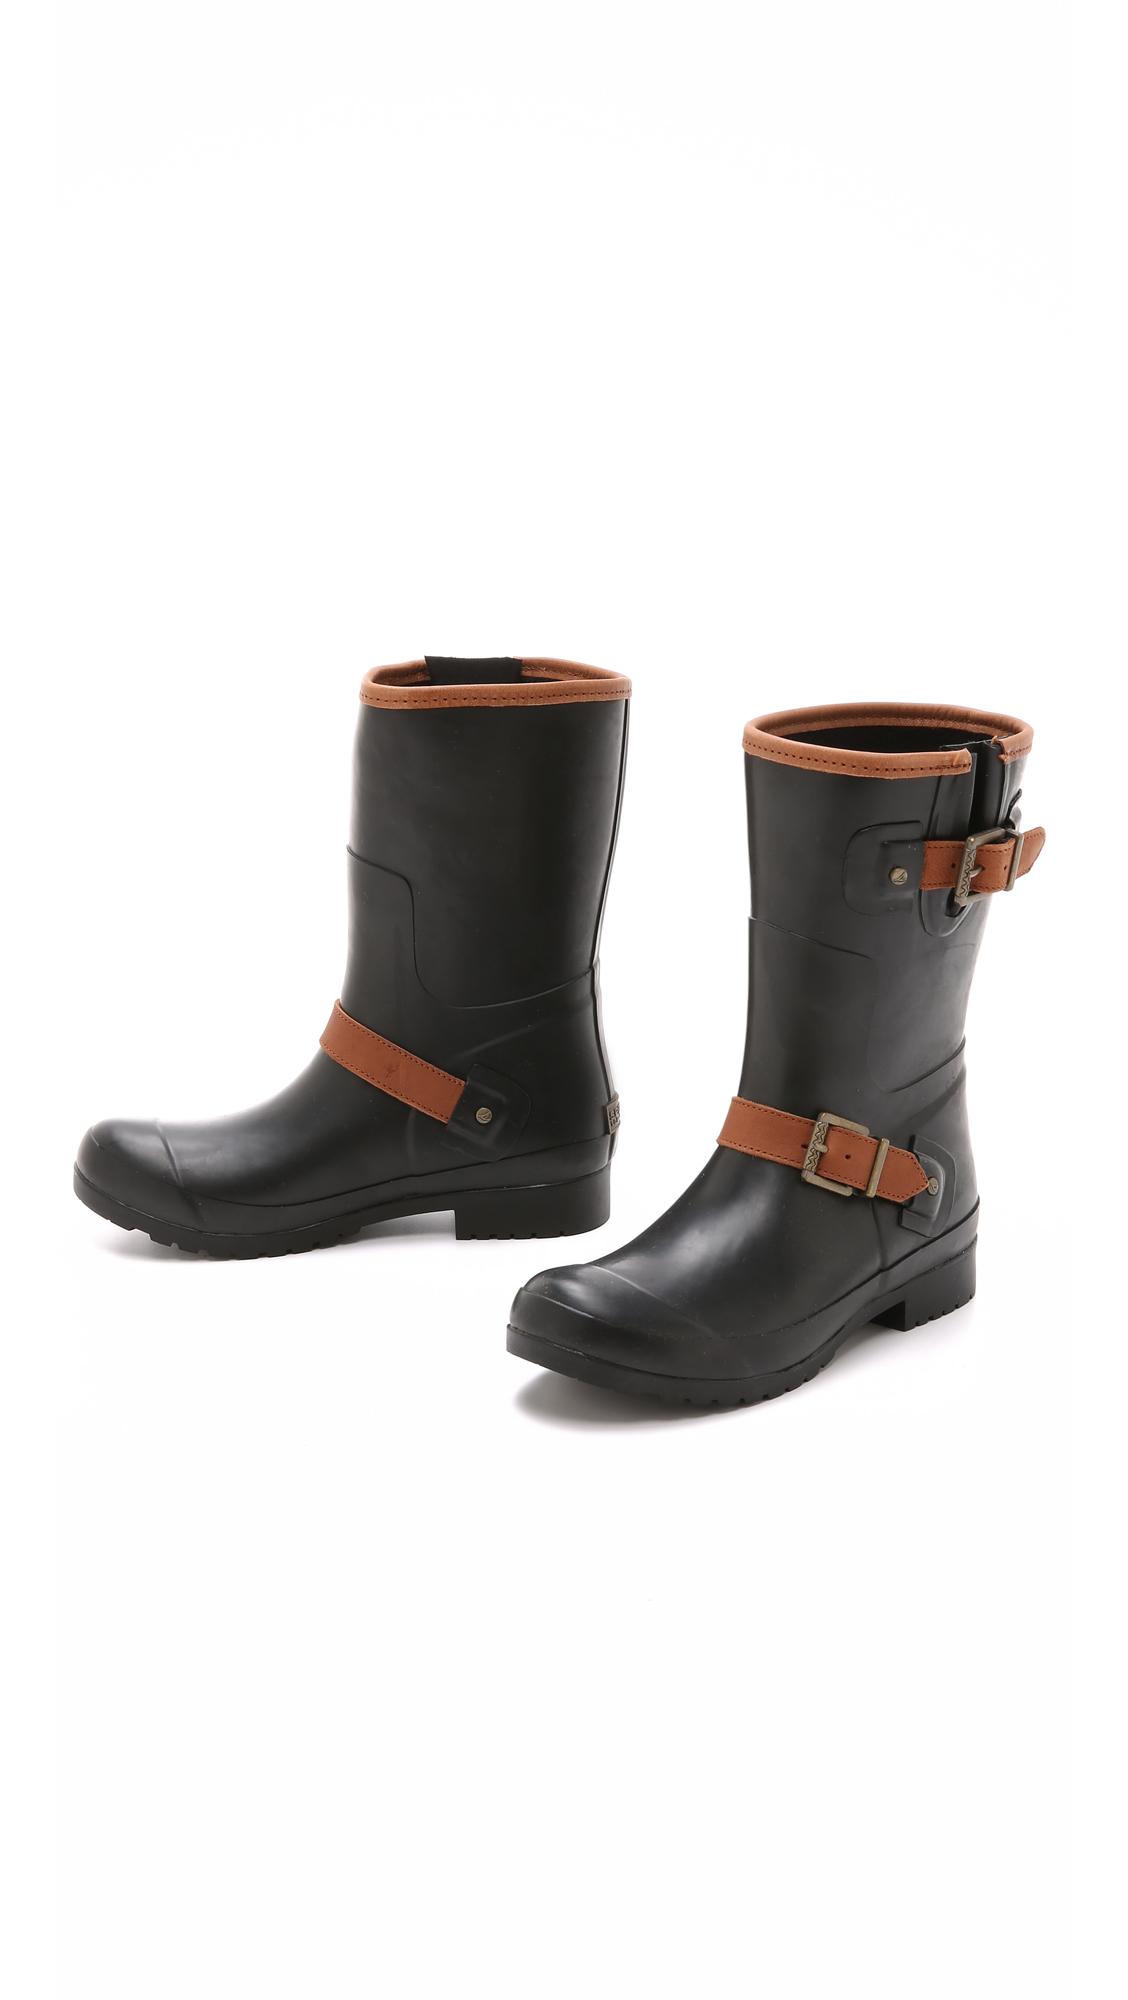 Sperry Top Sider Walker Fog Rain Boots Black In Black Lyst